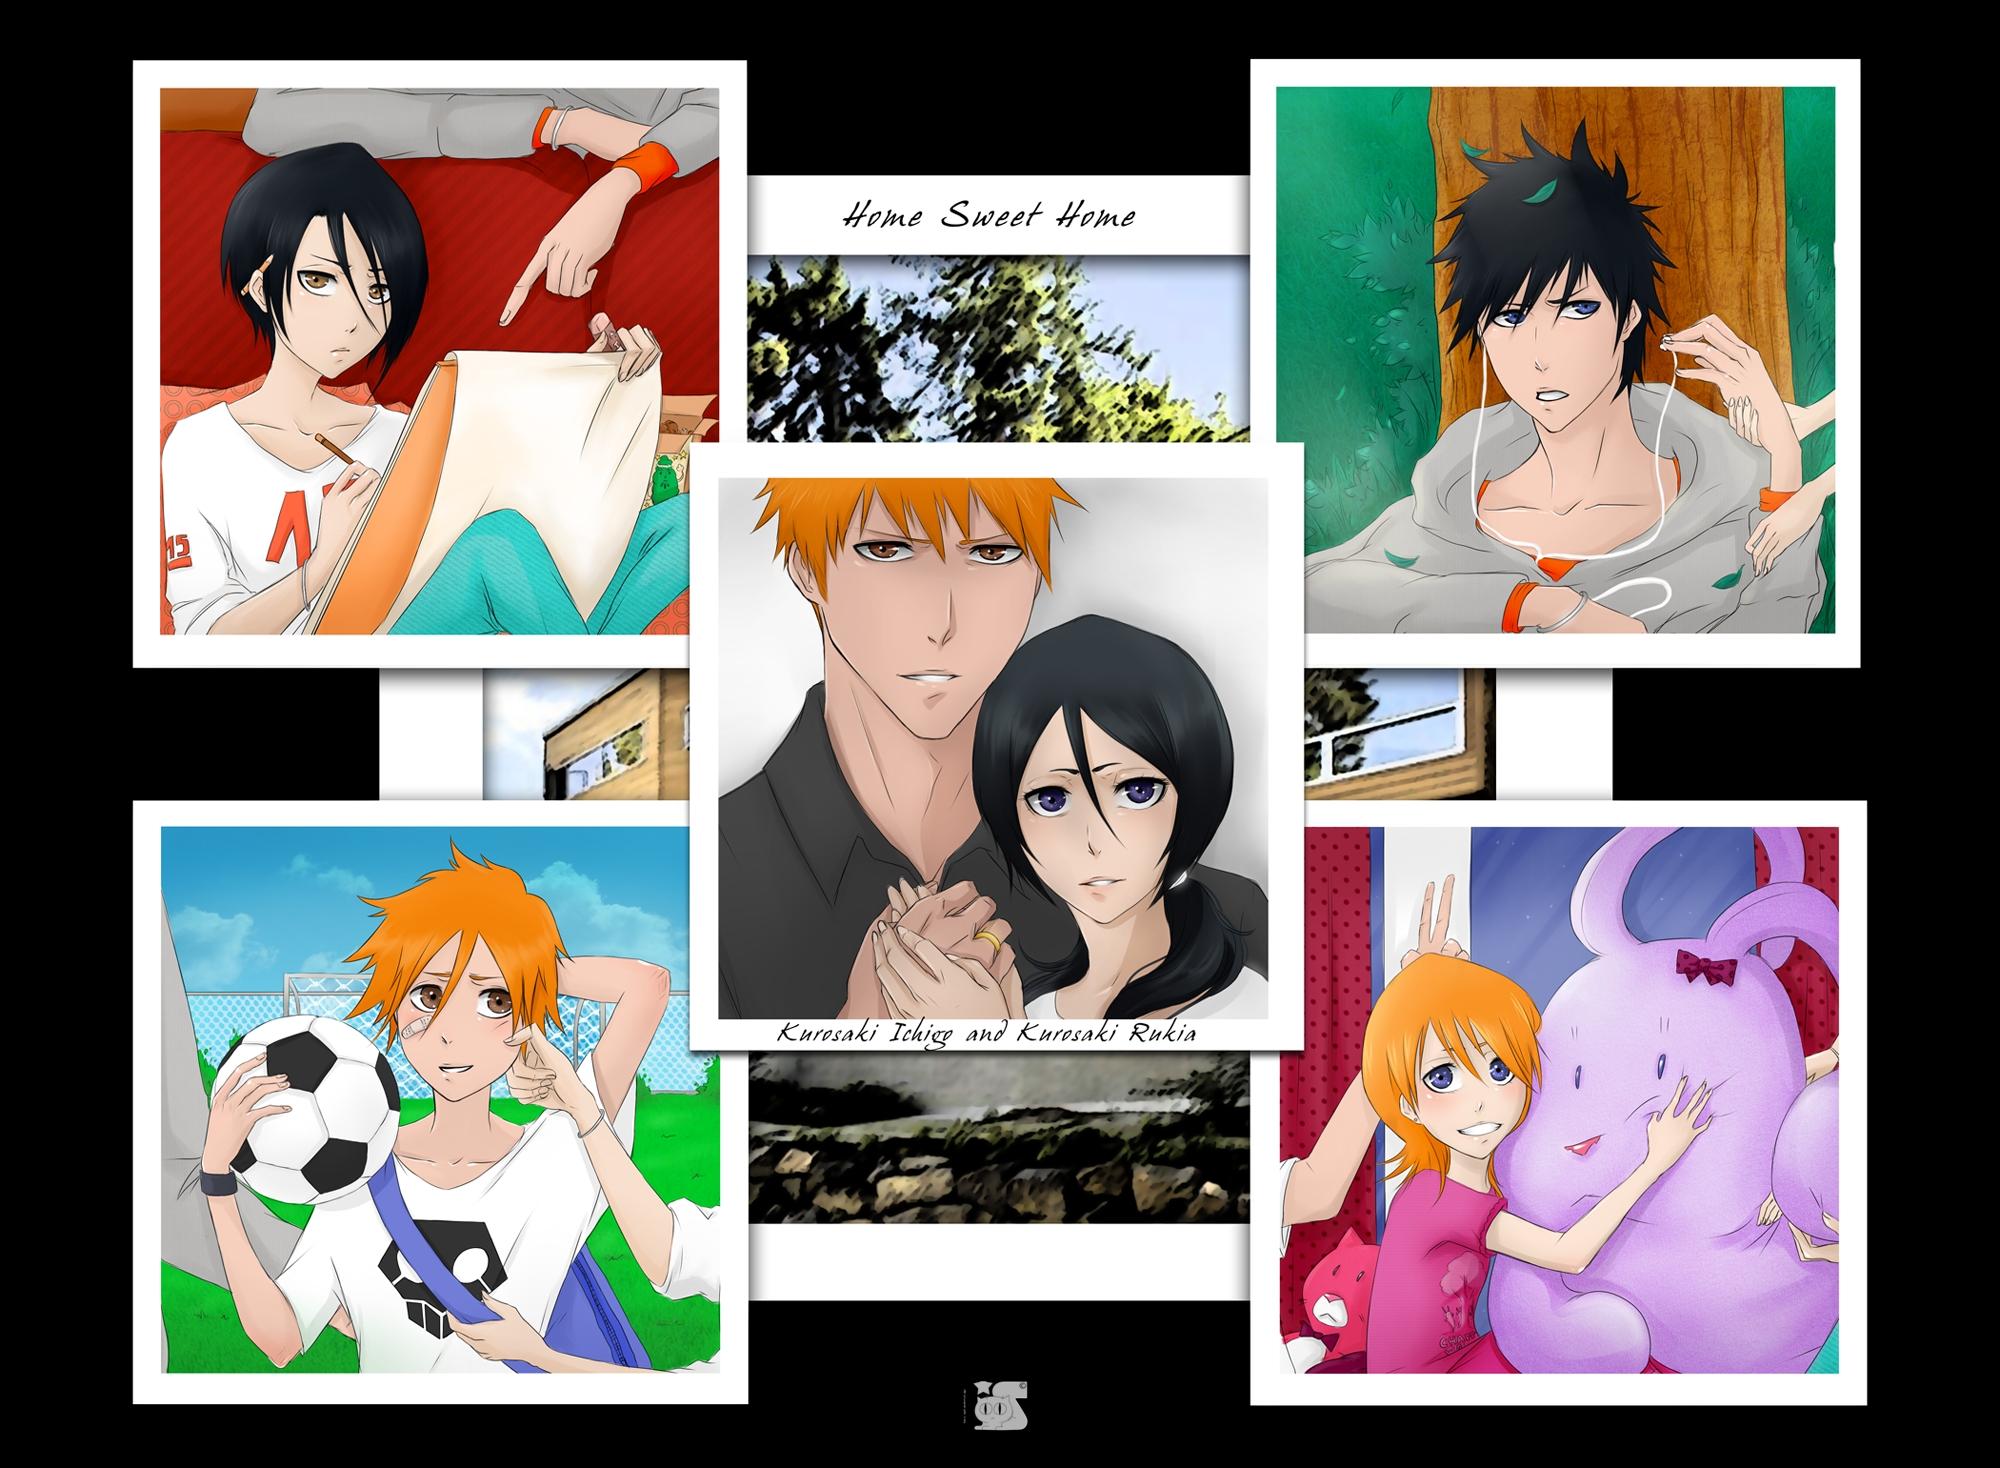 BLEACH - Tite Kubo - Image #1374273 - Zerochan Anime Image ...